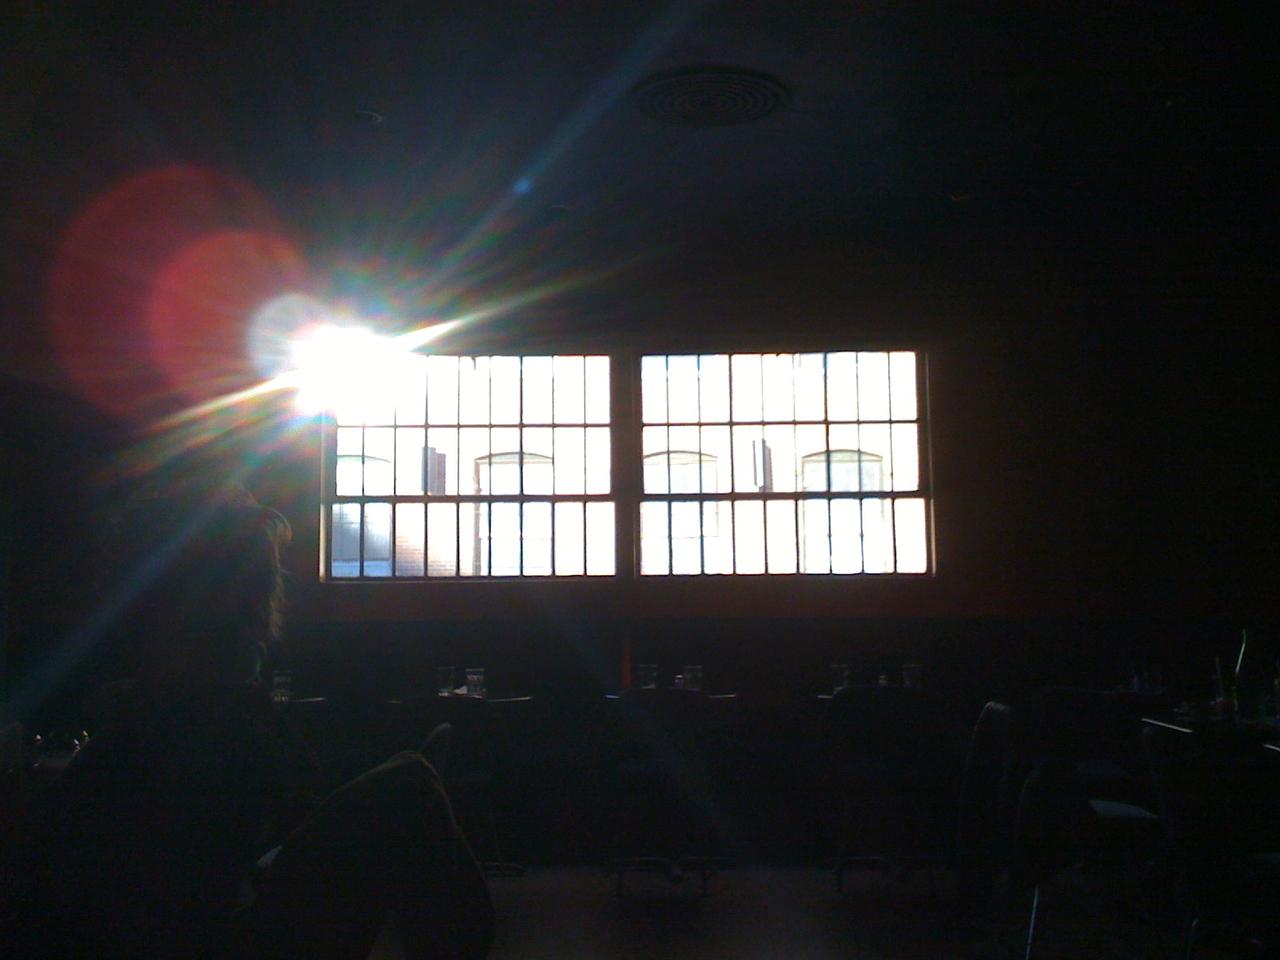 Relish sunbeams